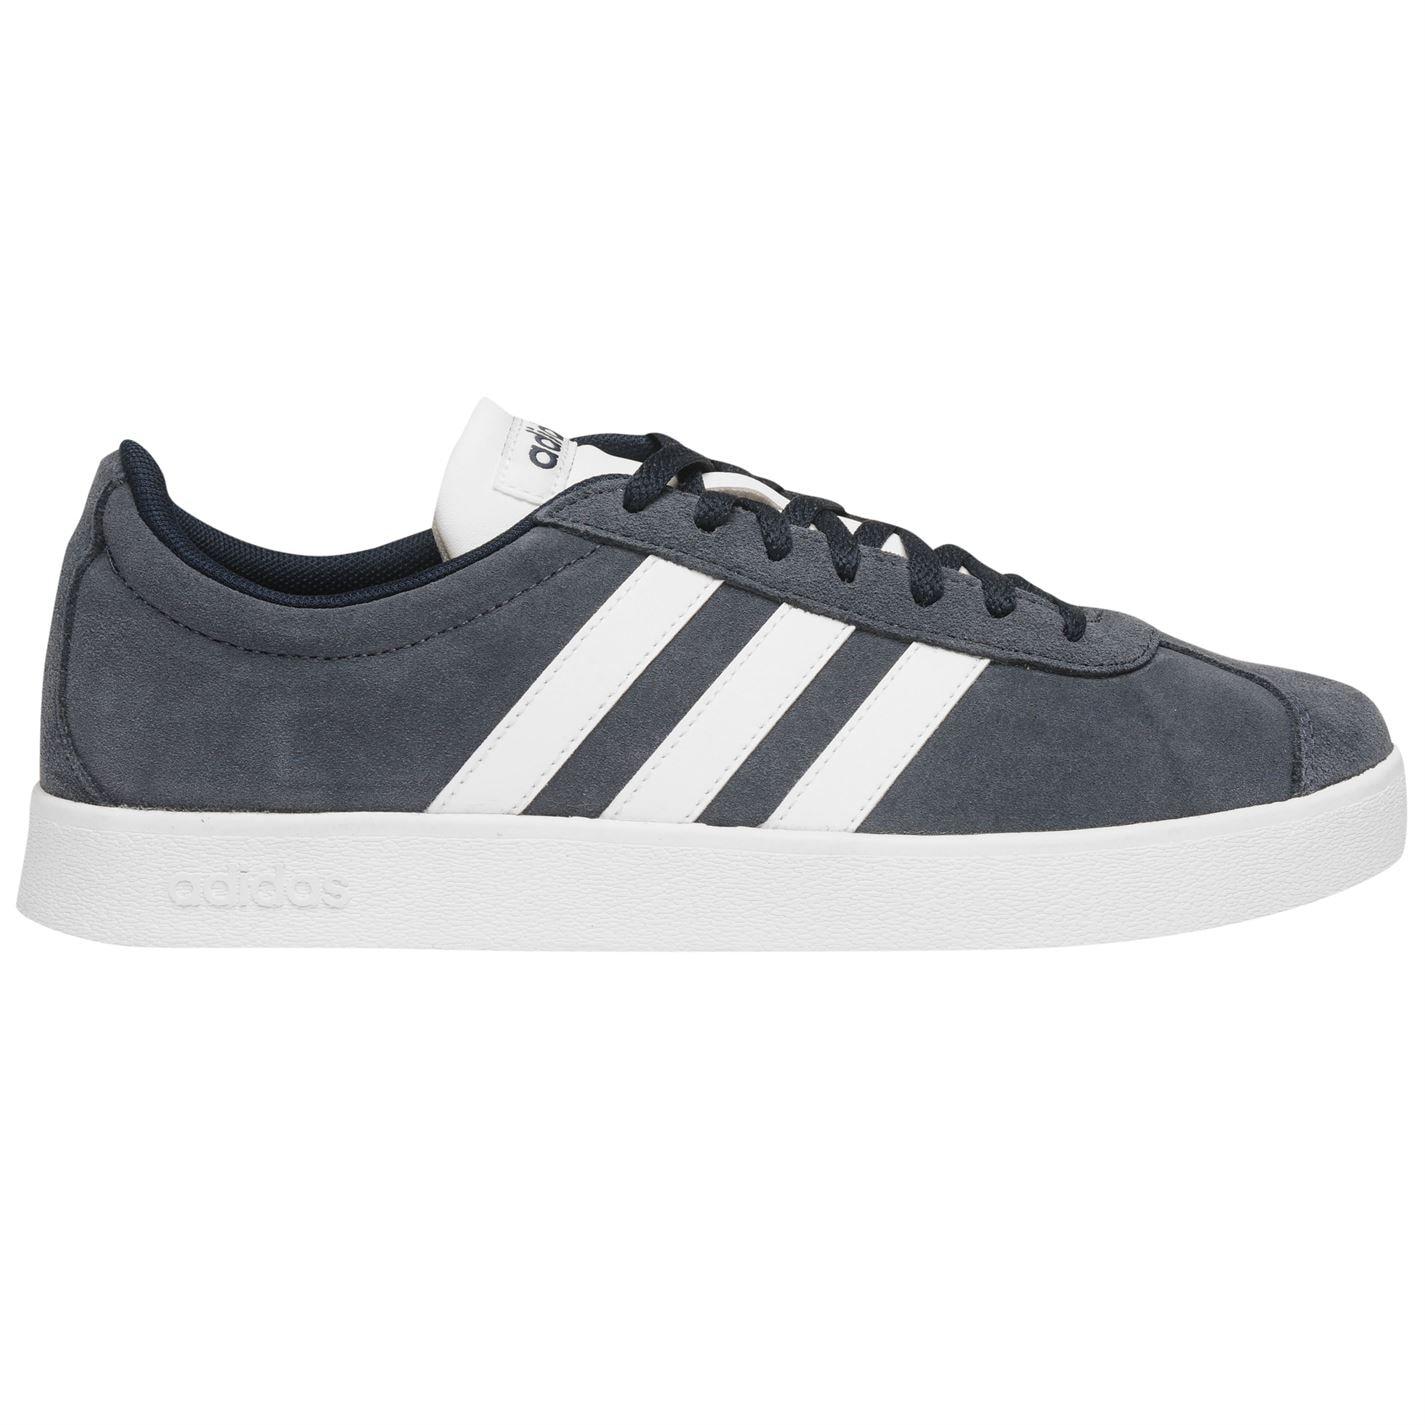 Adidas VL Court 2 Suede Pánská obuv 16303822 9 (43.3)